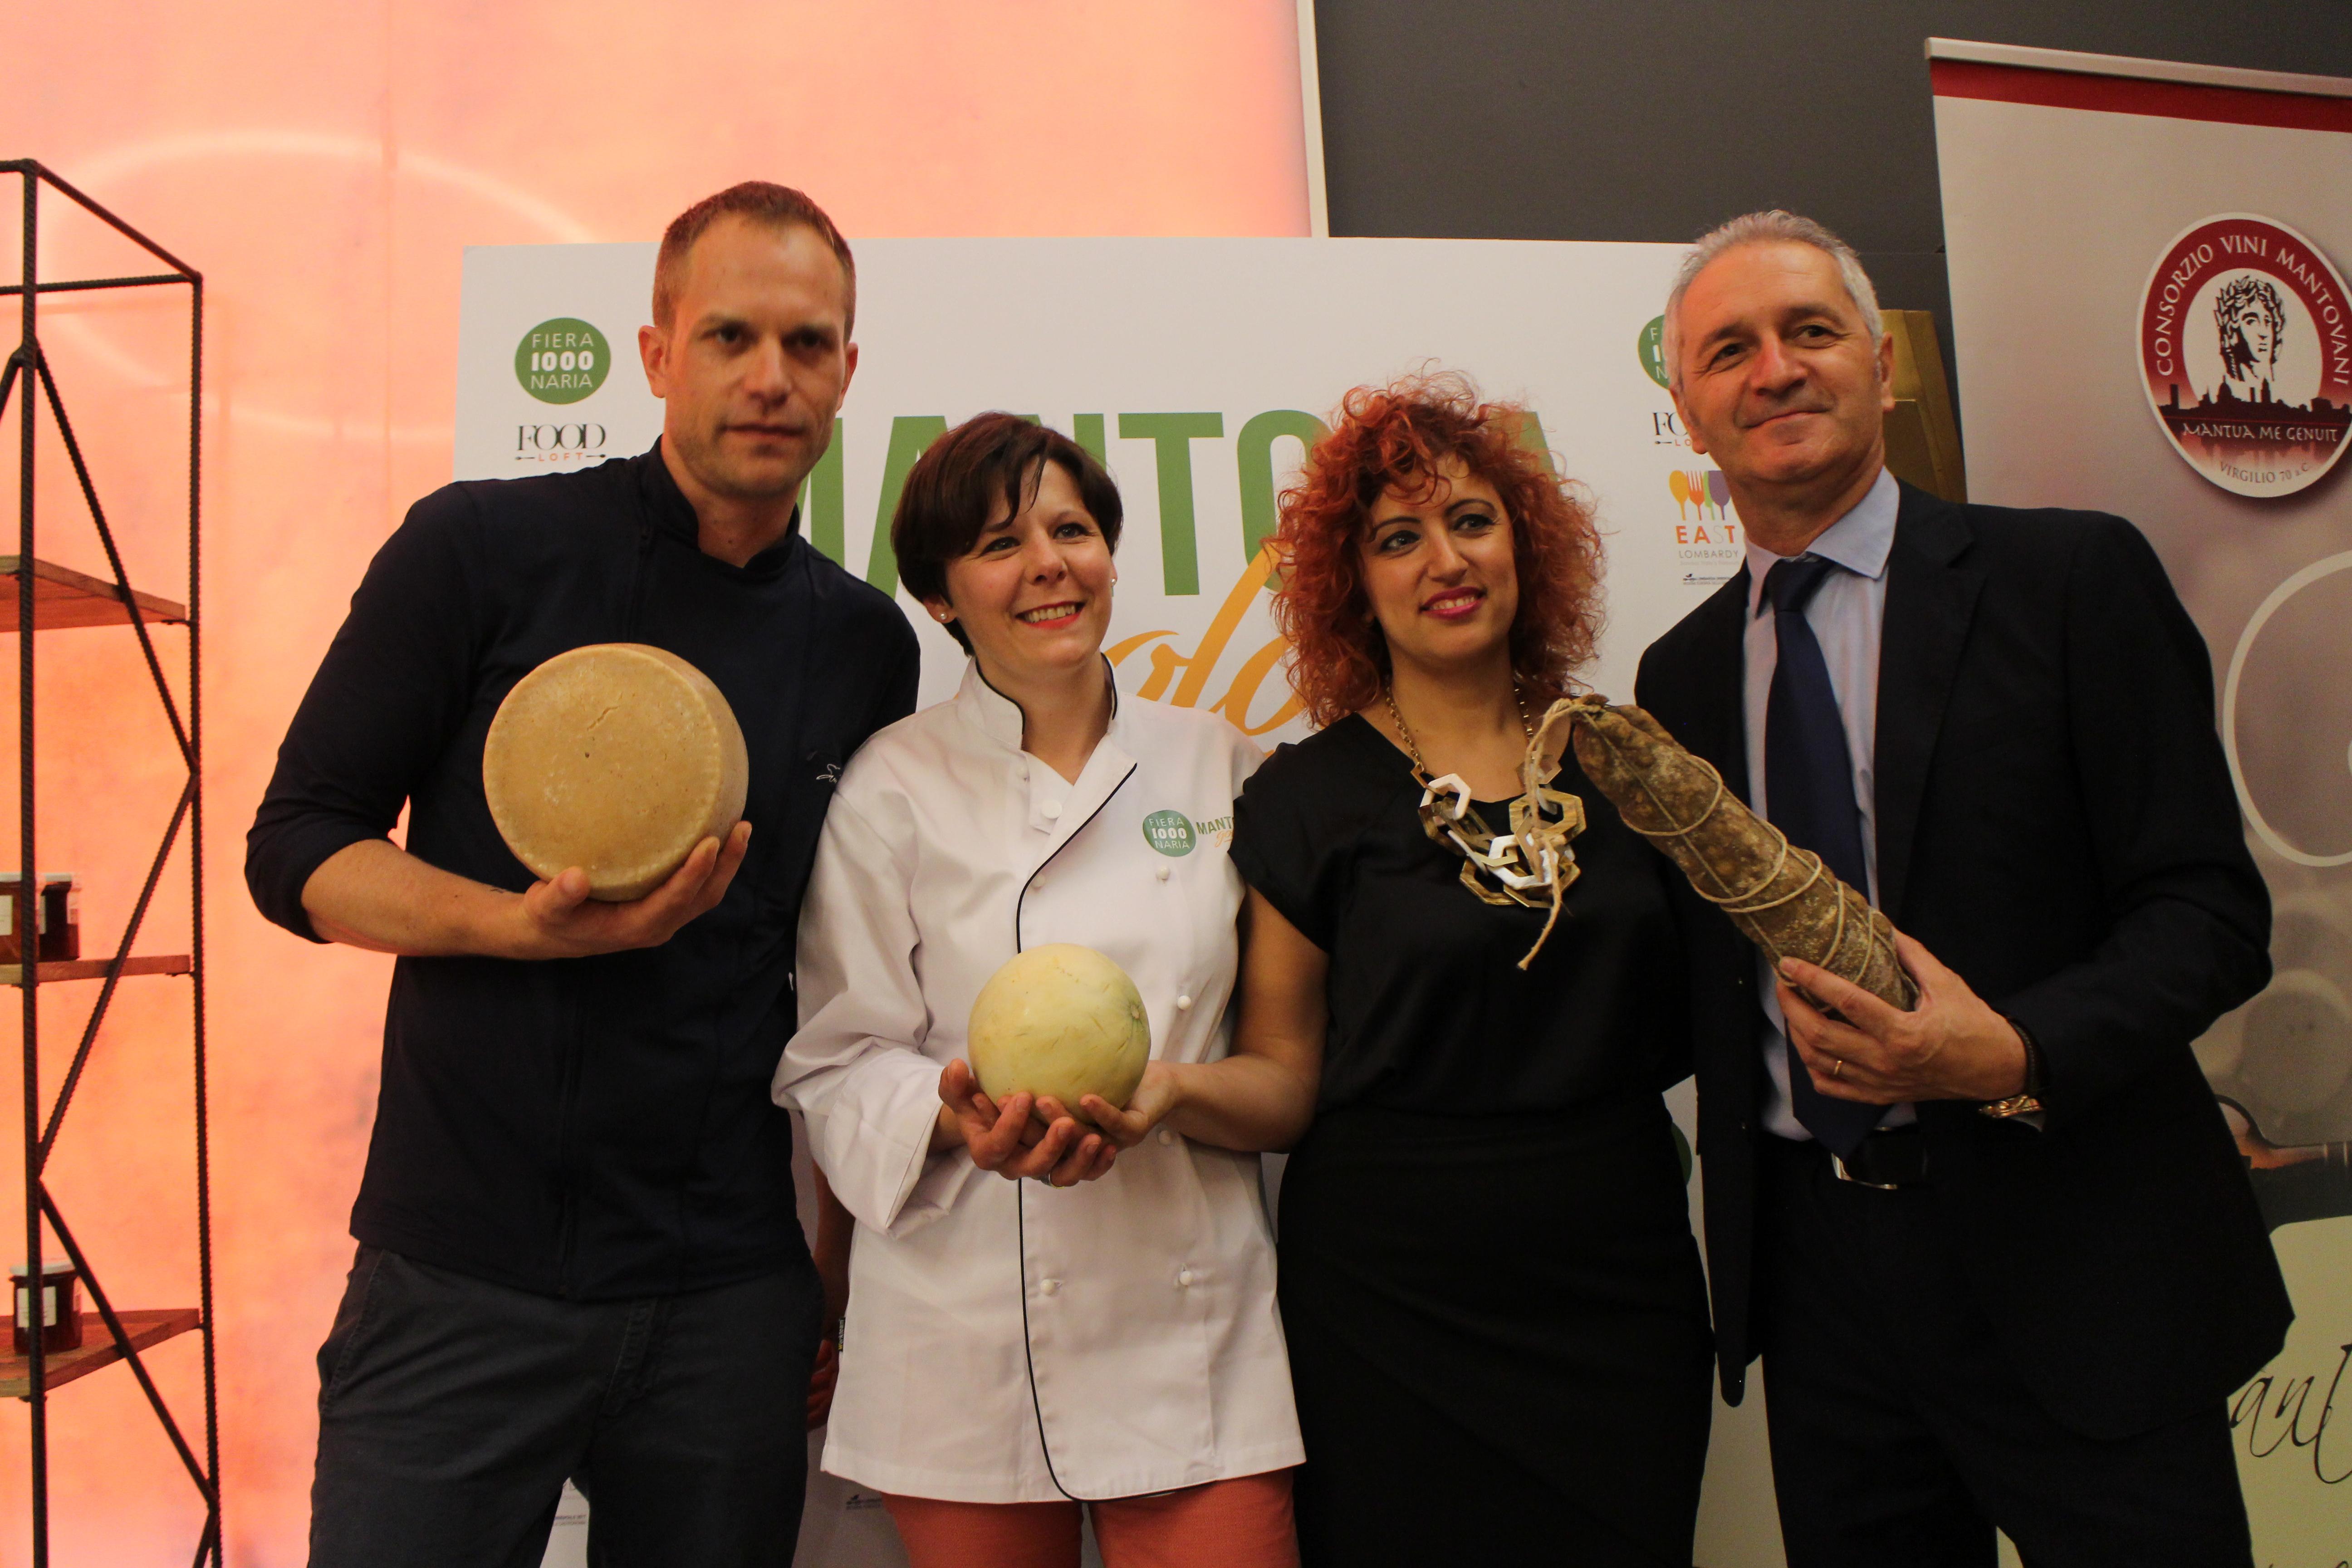 MILANO: IN ANTEPRIMA AL FOODLOFT, L'ECCELLENZA MANTOVANA